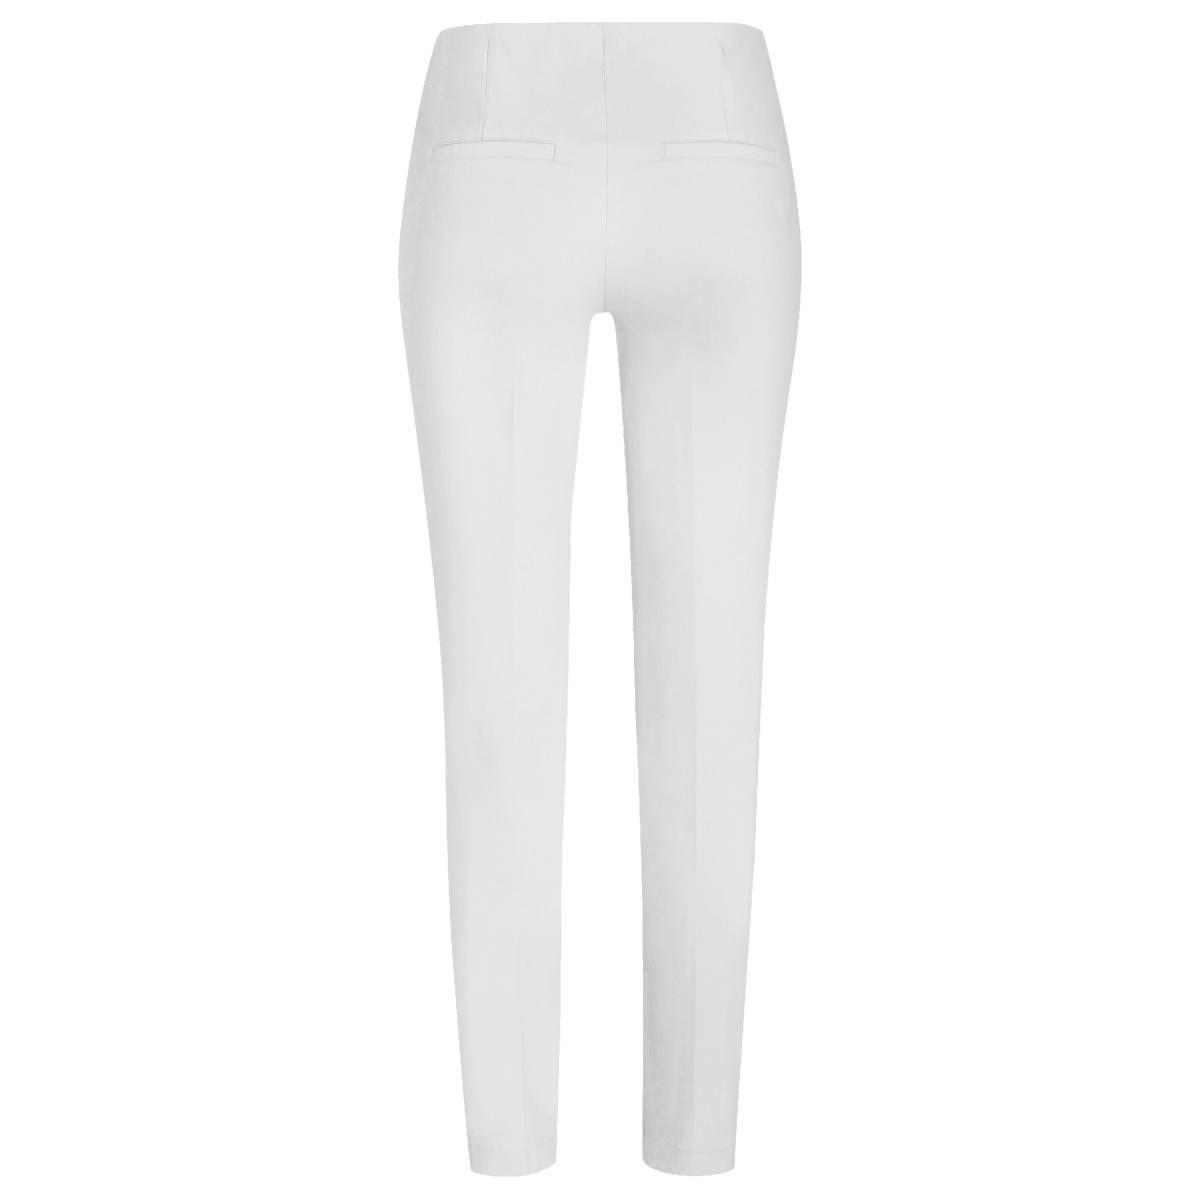 CAMBIO pantalon ros L29-4